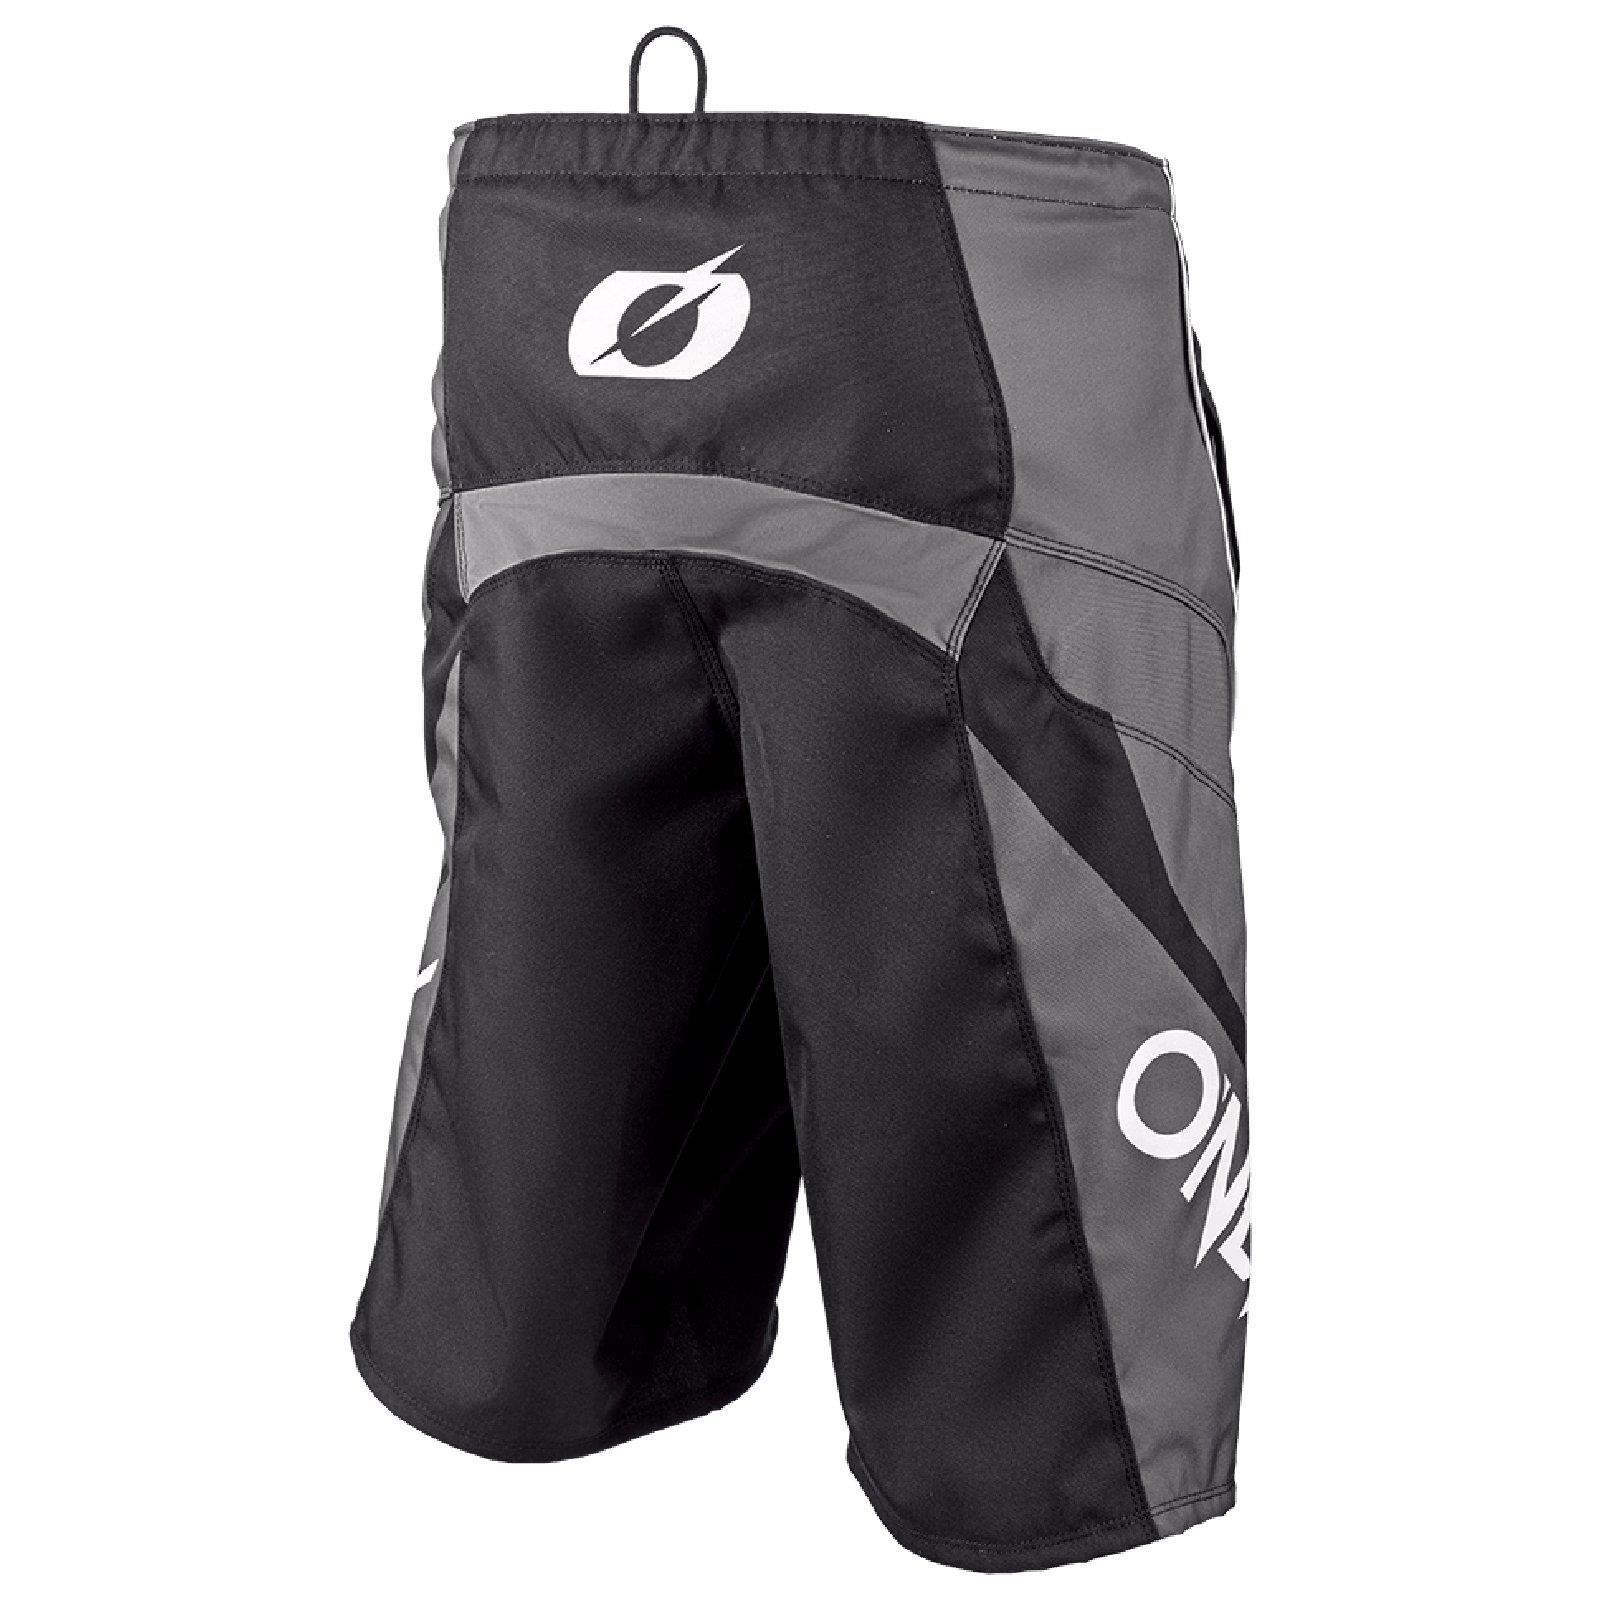 ONeal-pantalones-de-Jersey-de-los-ninos-de-pantalones-cortos-ninos-MX-bicicleta-DH-montana-bicicleta miniatura 16